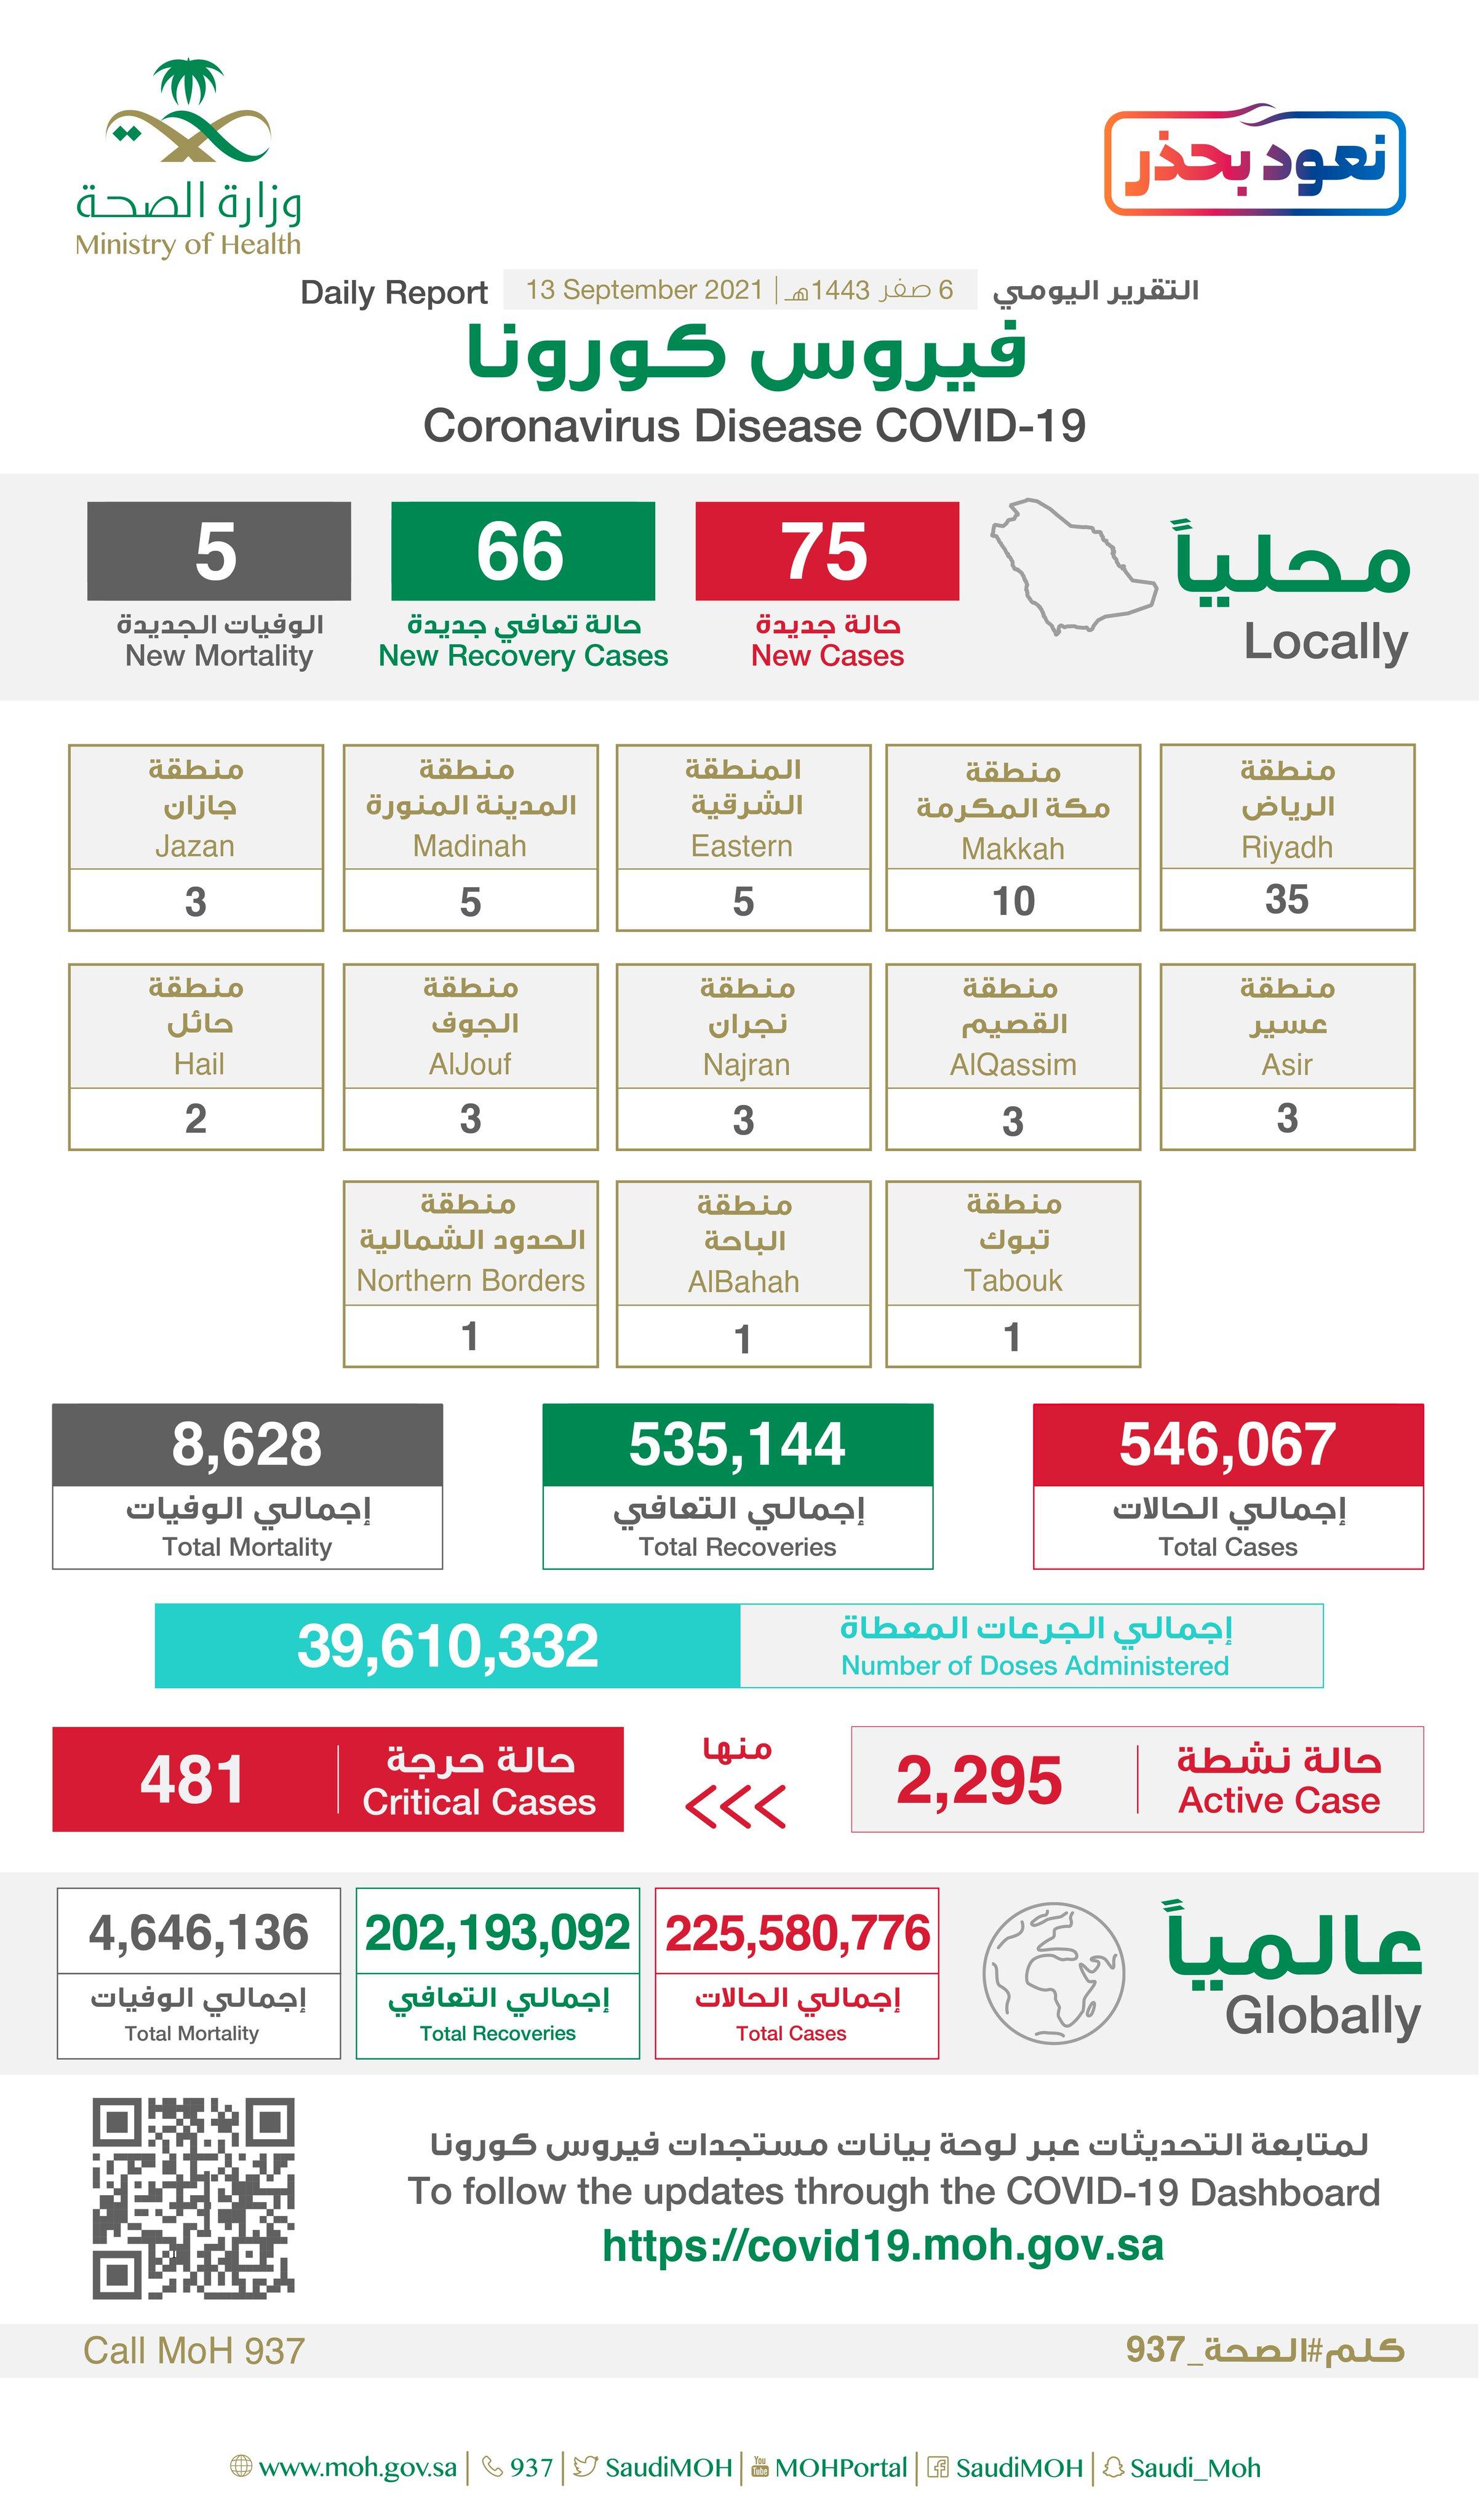 Saudi Arabia Coronavirus : Total Cases : 546,067 , New Cases : 75, Cured : 535,144 , Deaths: 8,628, Active Cases : 2,295